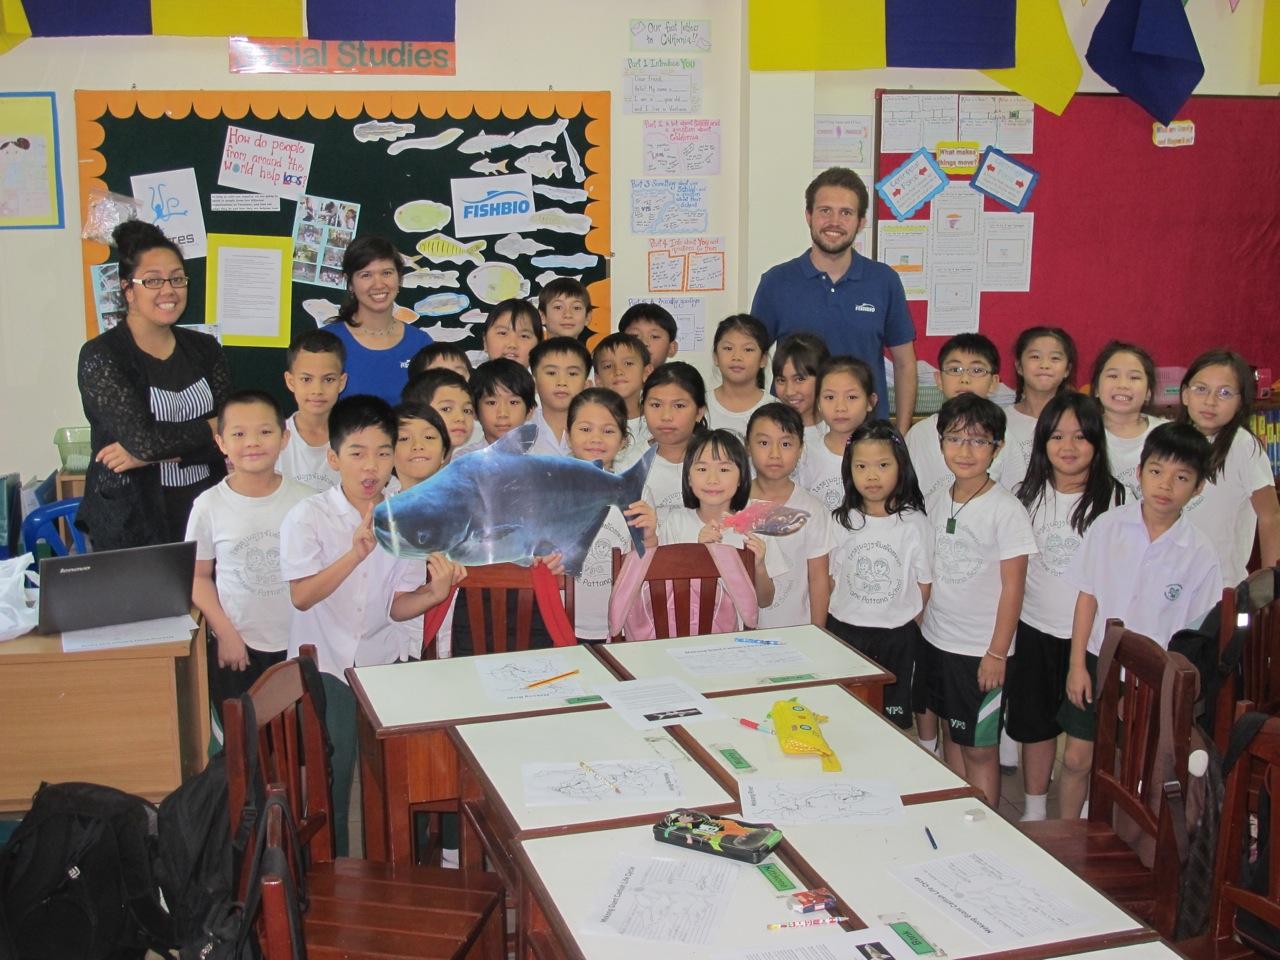 FISHBIO staff visit a Lao classroom